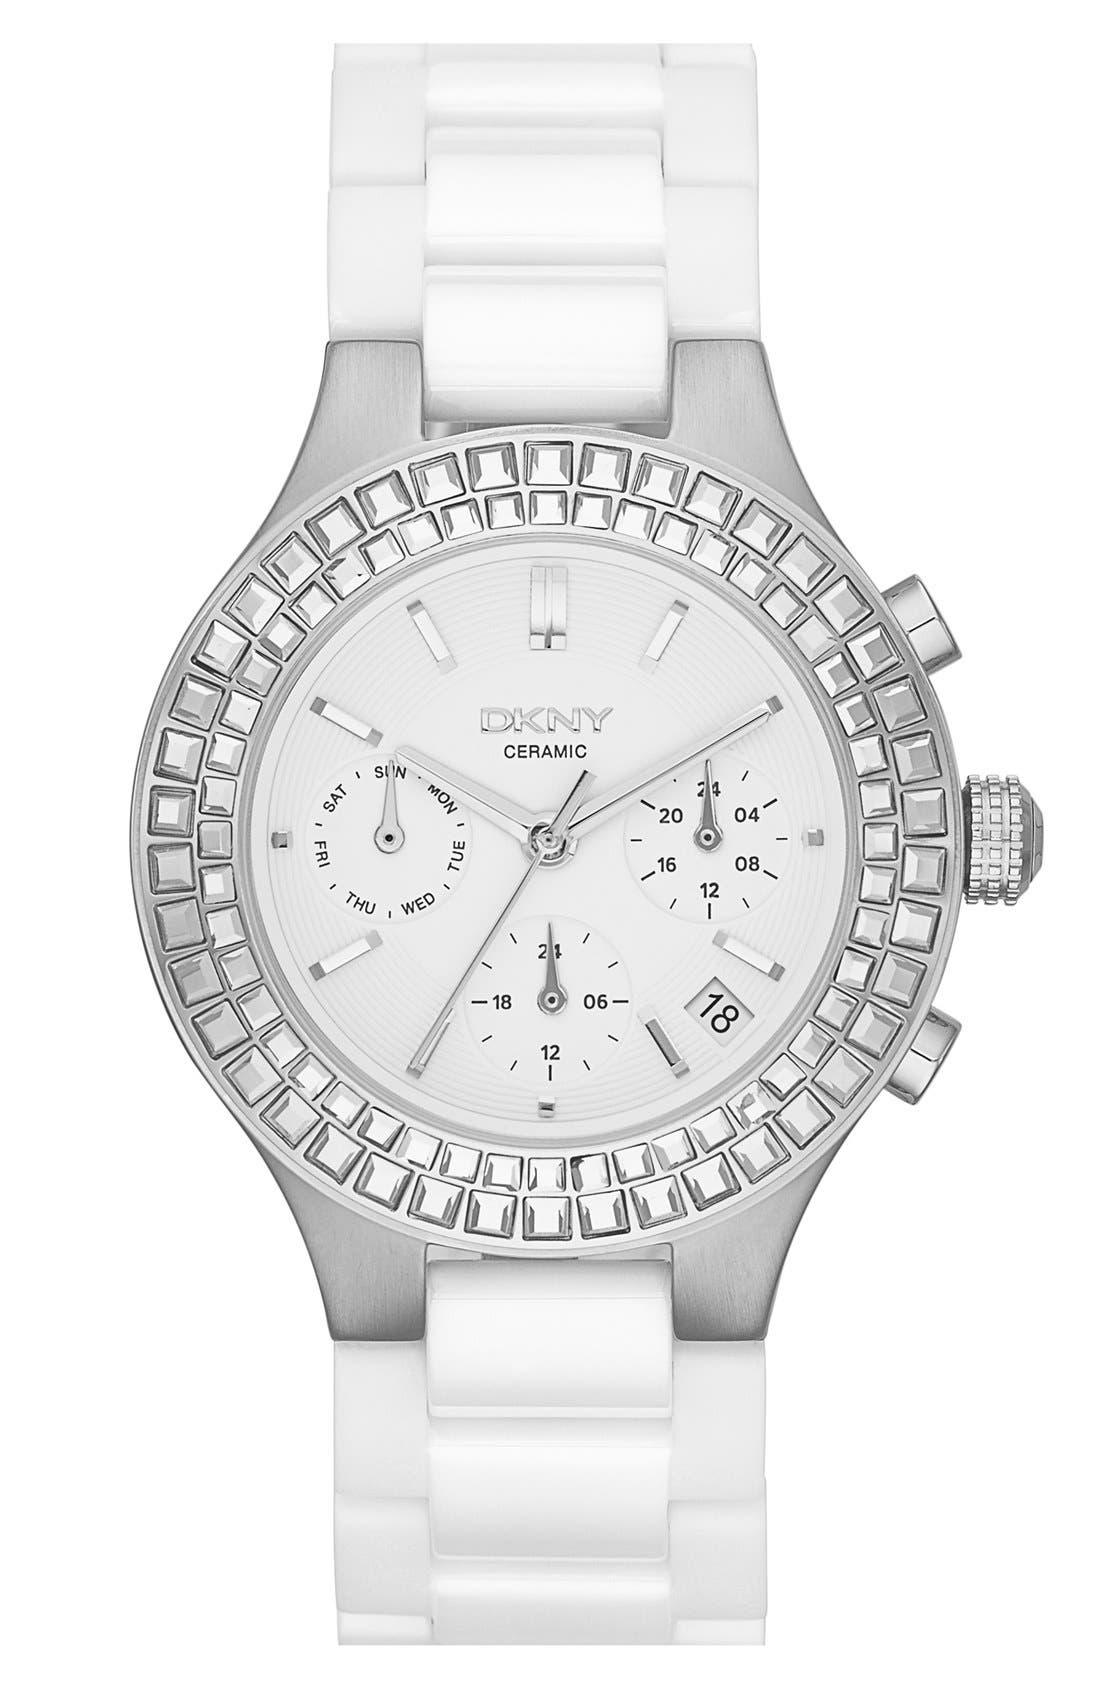 Main Image - DKNY 'Chambers' Crystal Bezel Multifunction Ceramic Bracelet Watch, 38mm